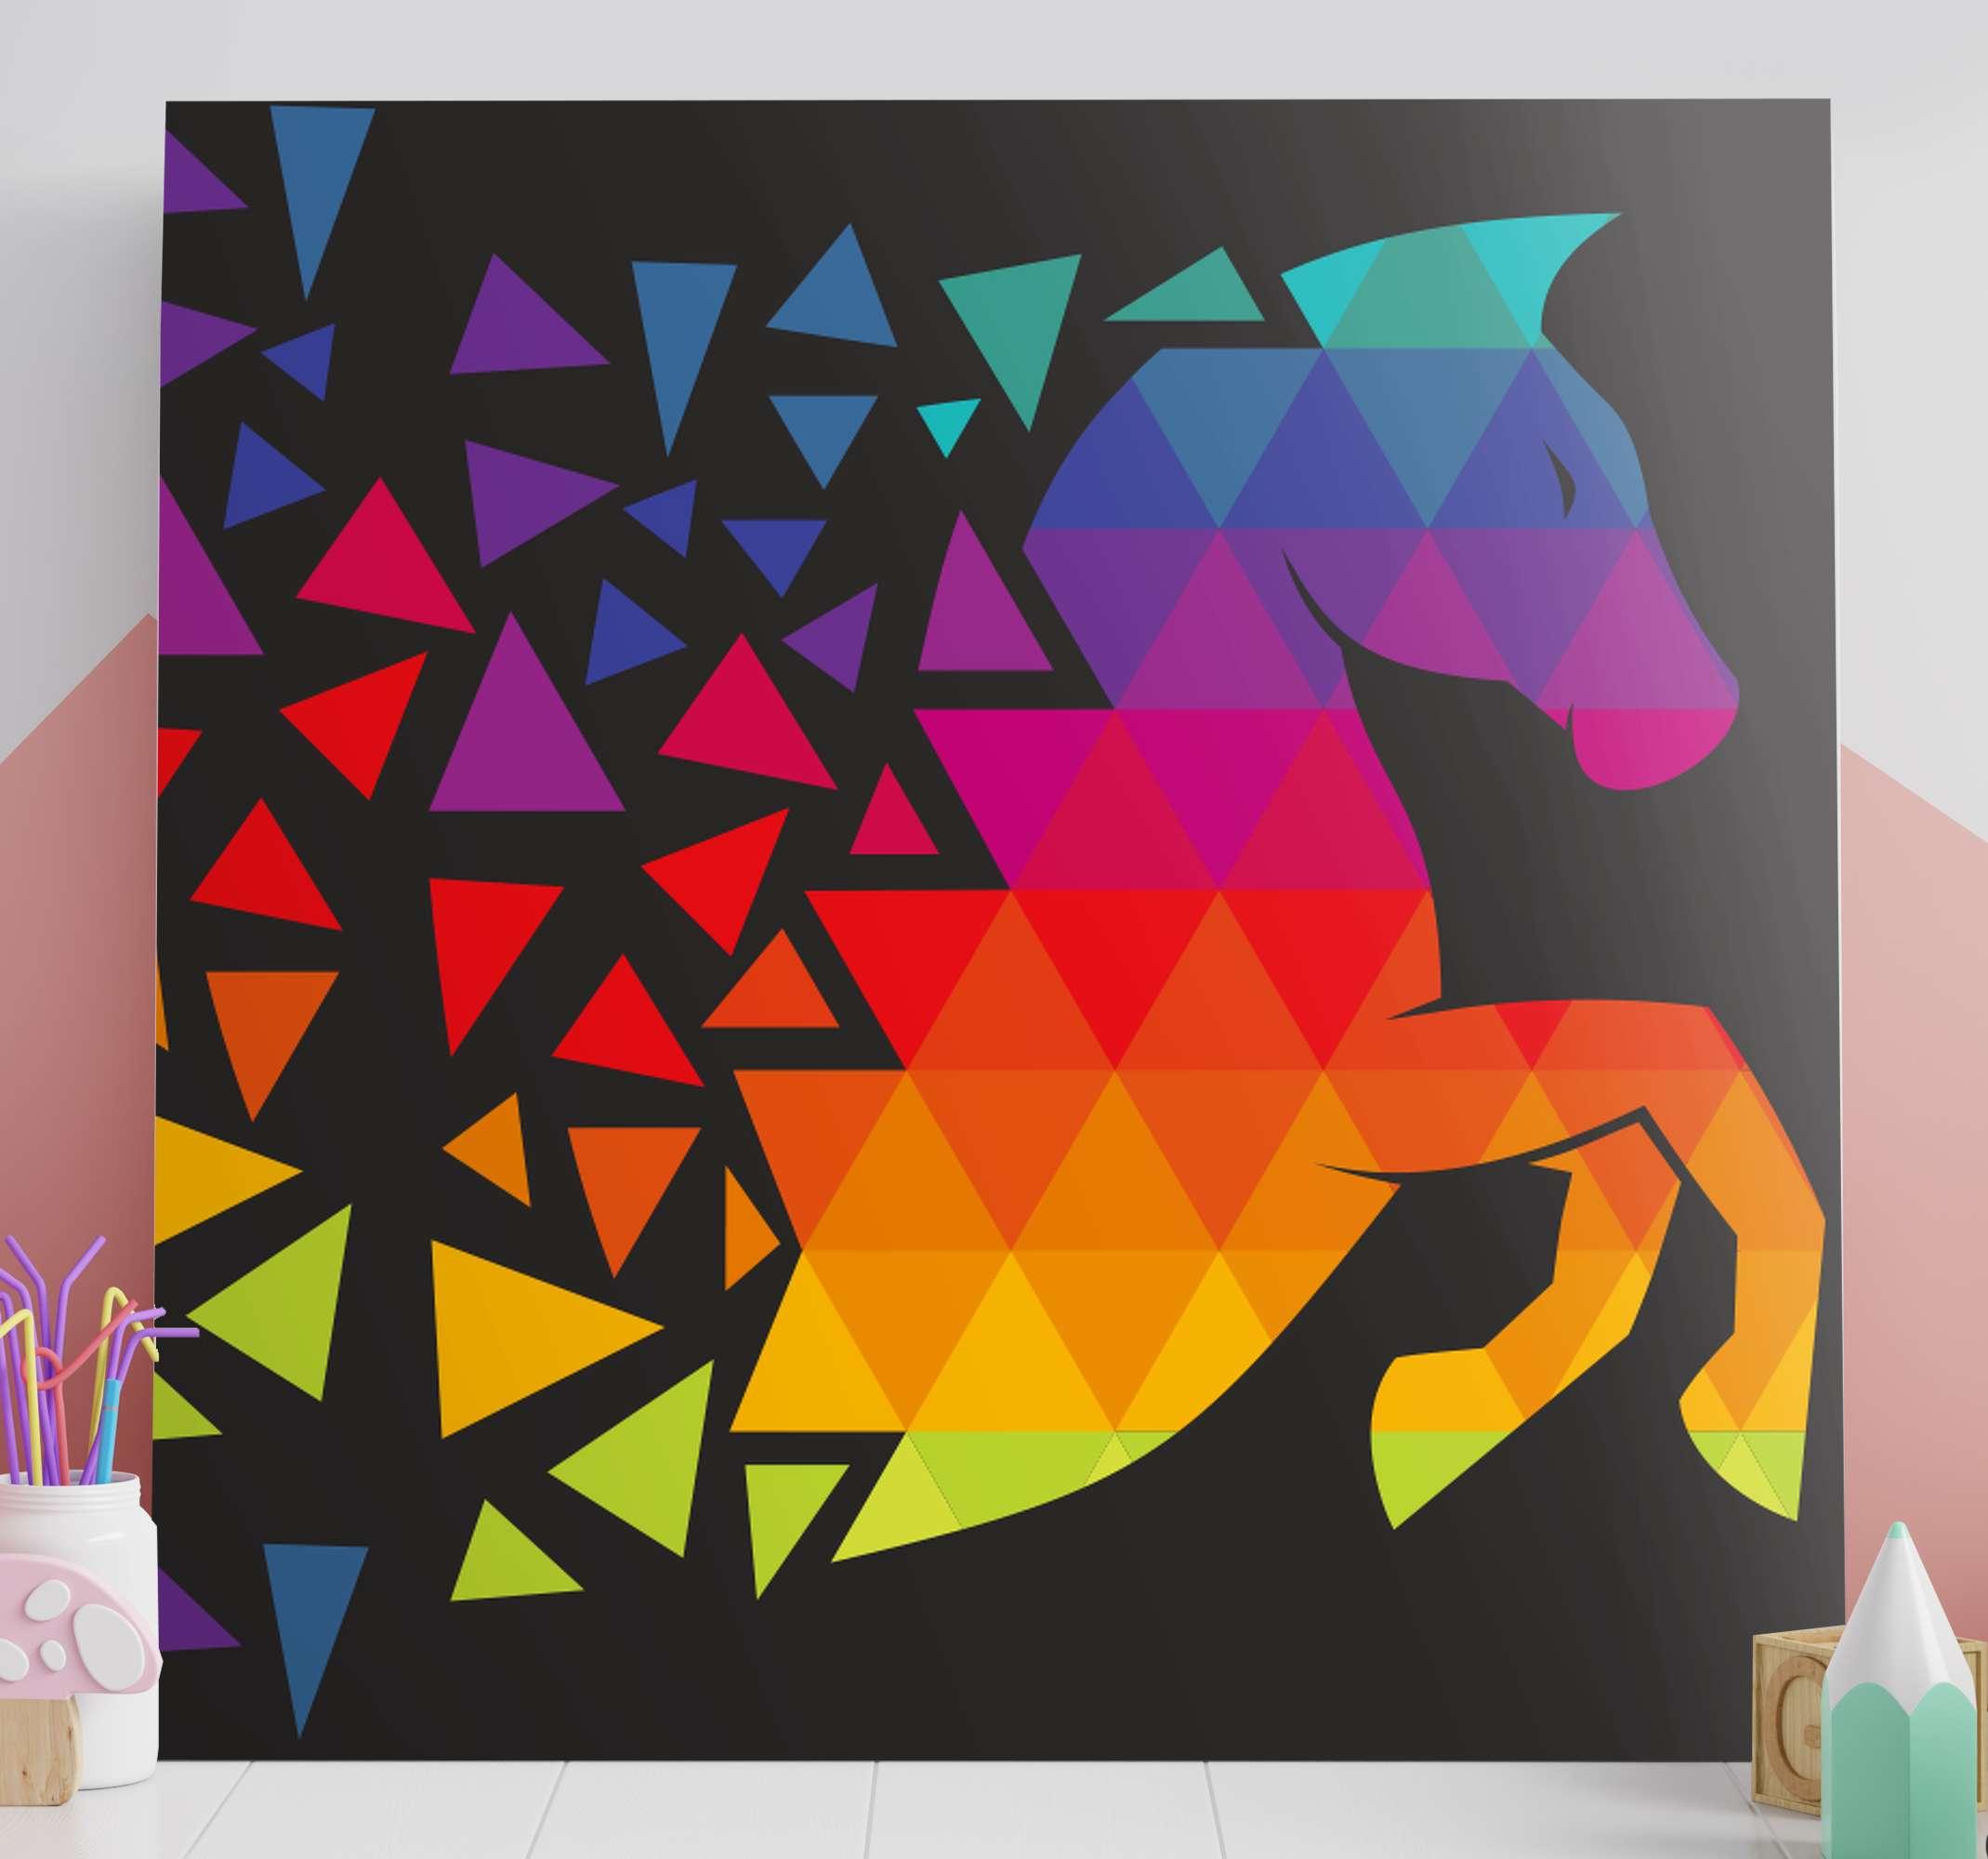 TenStickers. 다채로운 dods 액자 말 사진 말. 이 멋진 말 캔버스 프린트 제품으로 모든 친구와 가족이 새로운 장식을 질투 할 것입니다! 지금 구입하세요!